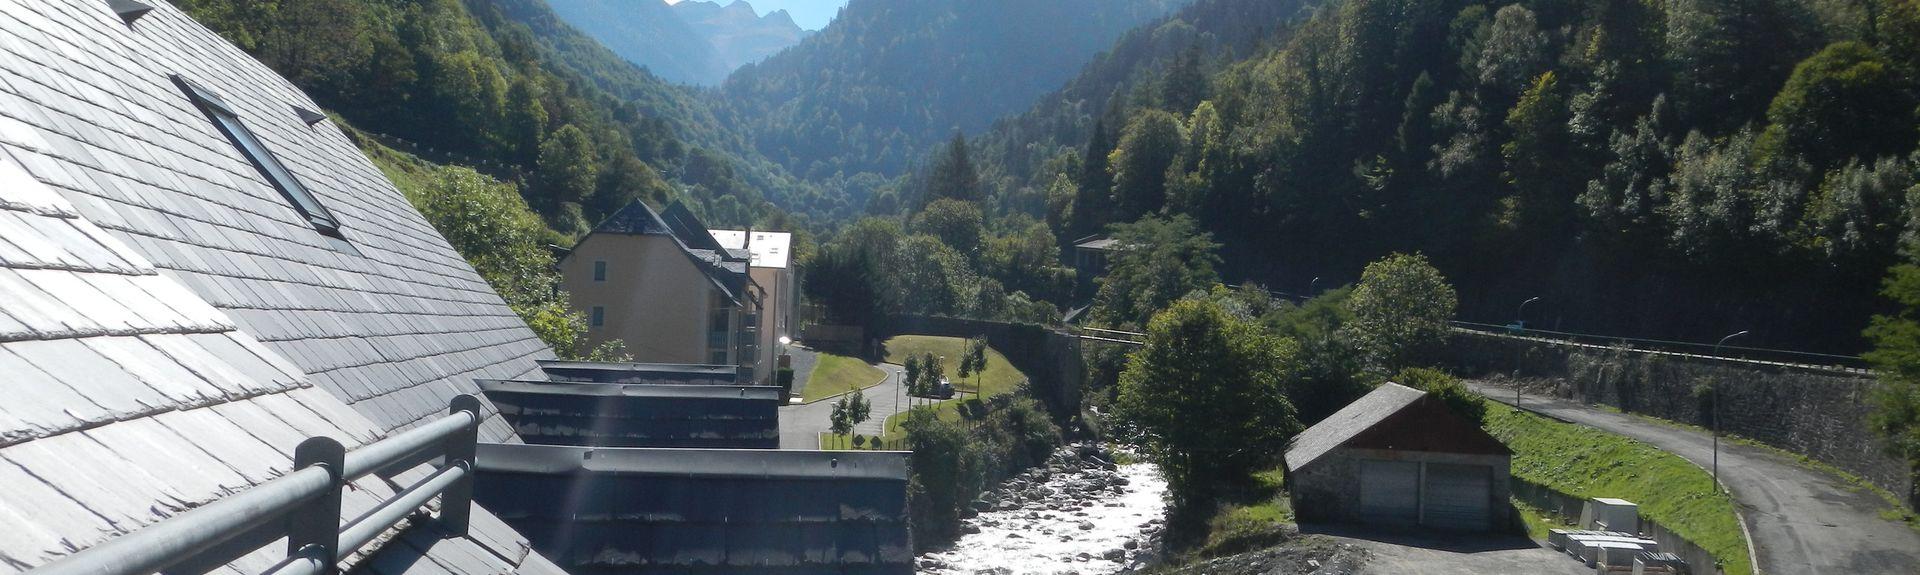 Nationalparken i Pyrenæerne, Occitanie, Frankrig